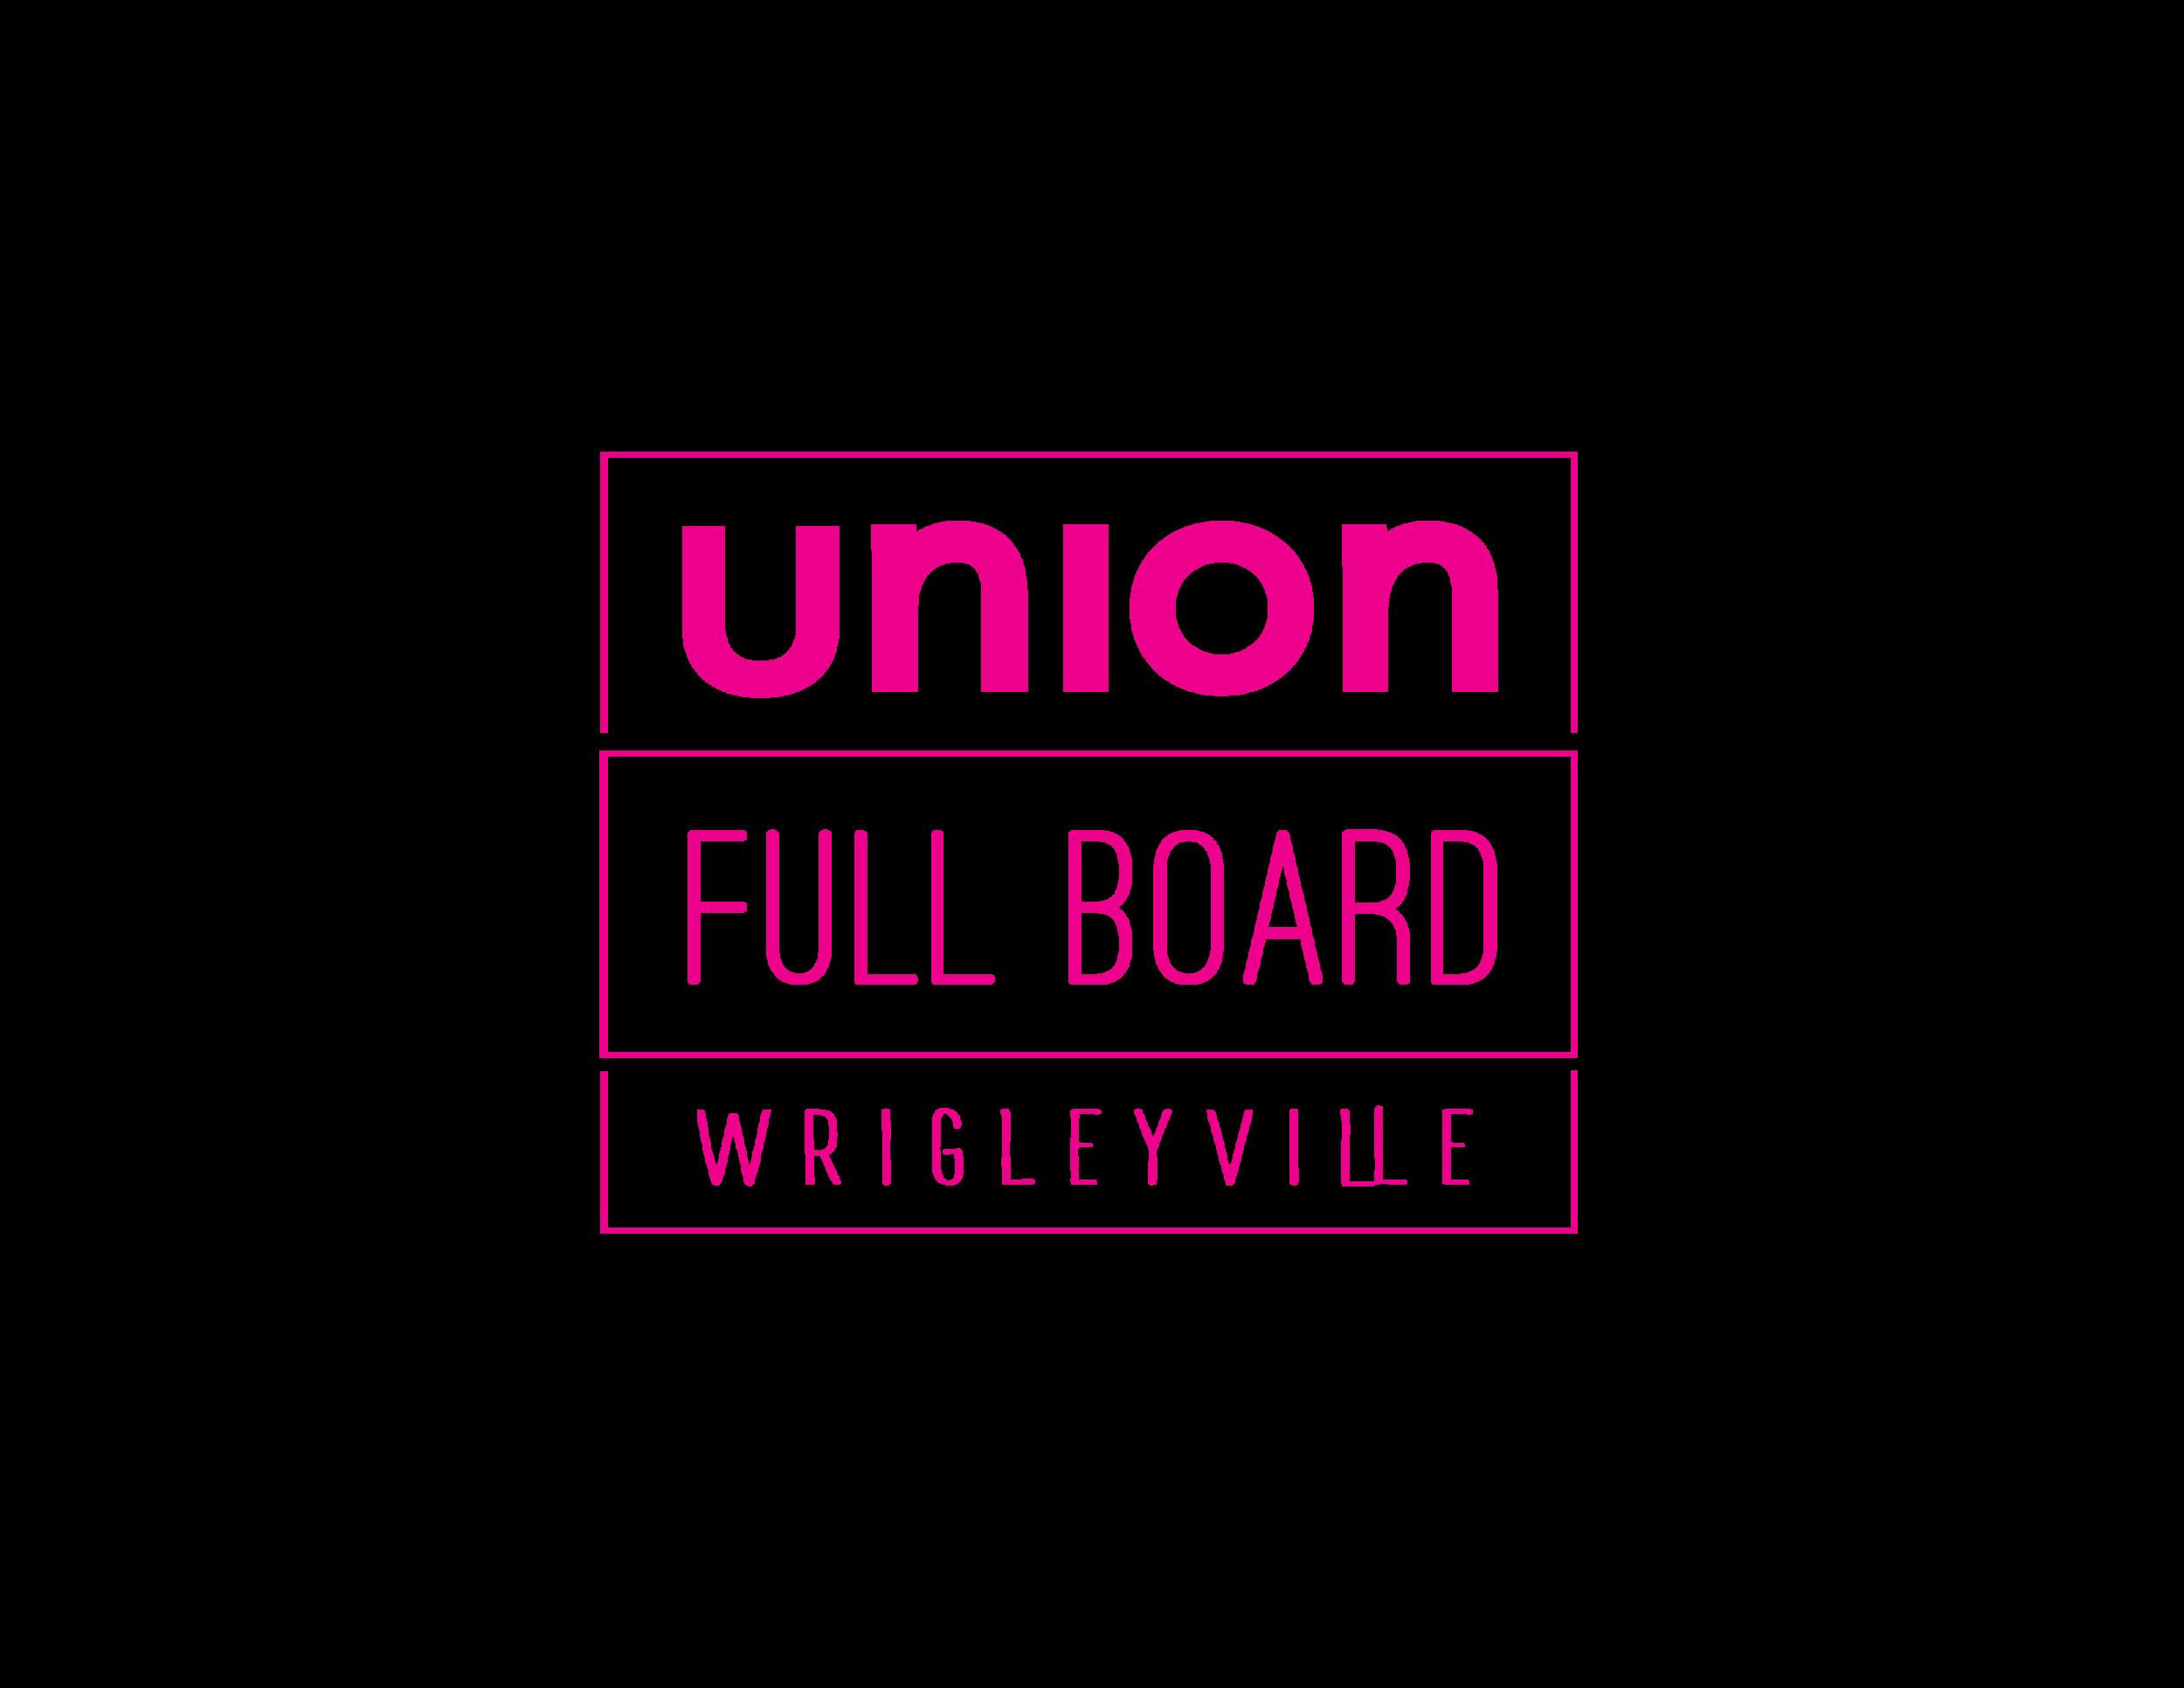 Union Full Board Logo_Union Full Board Logo.png